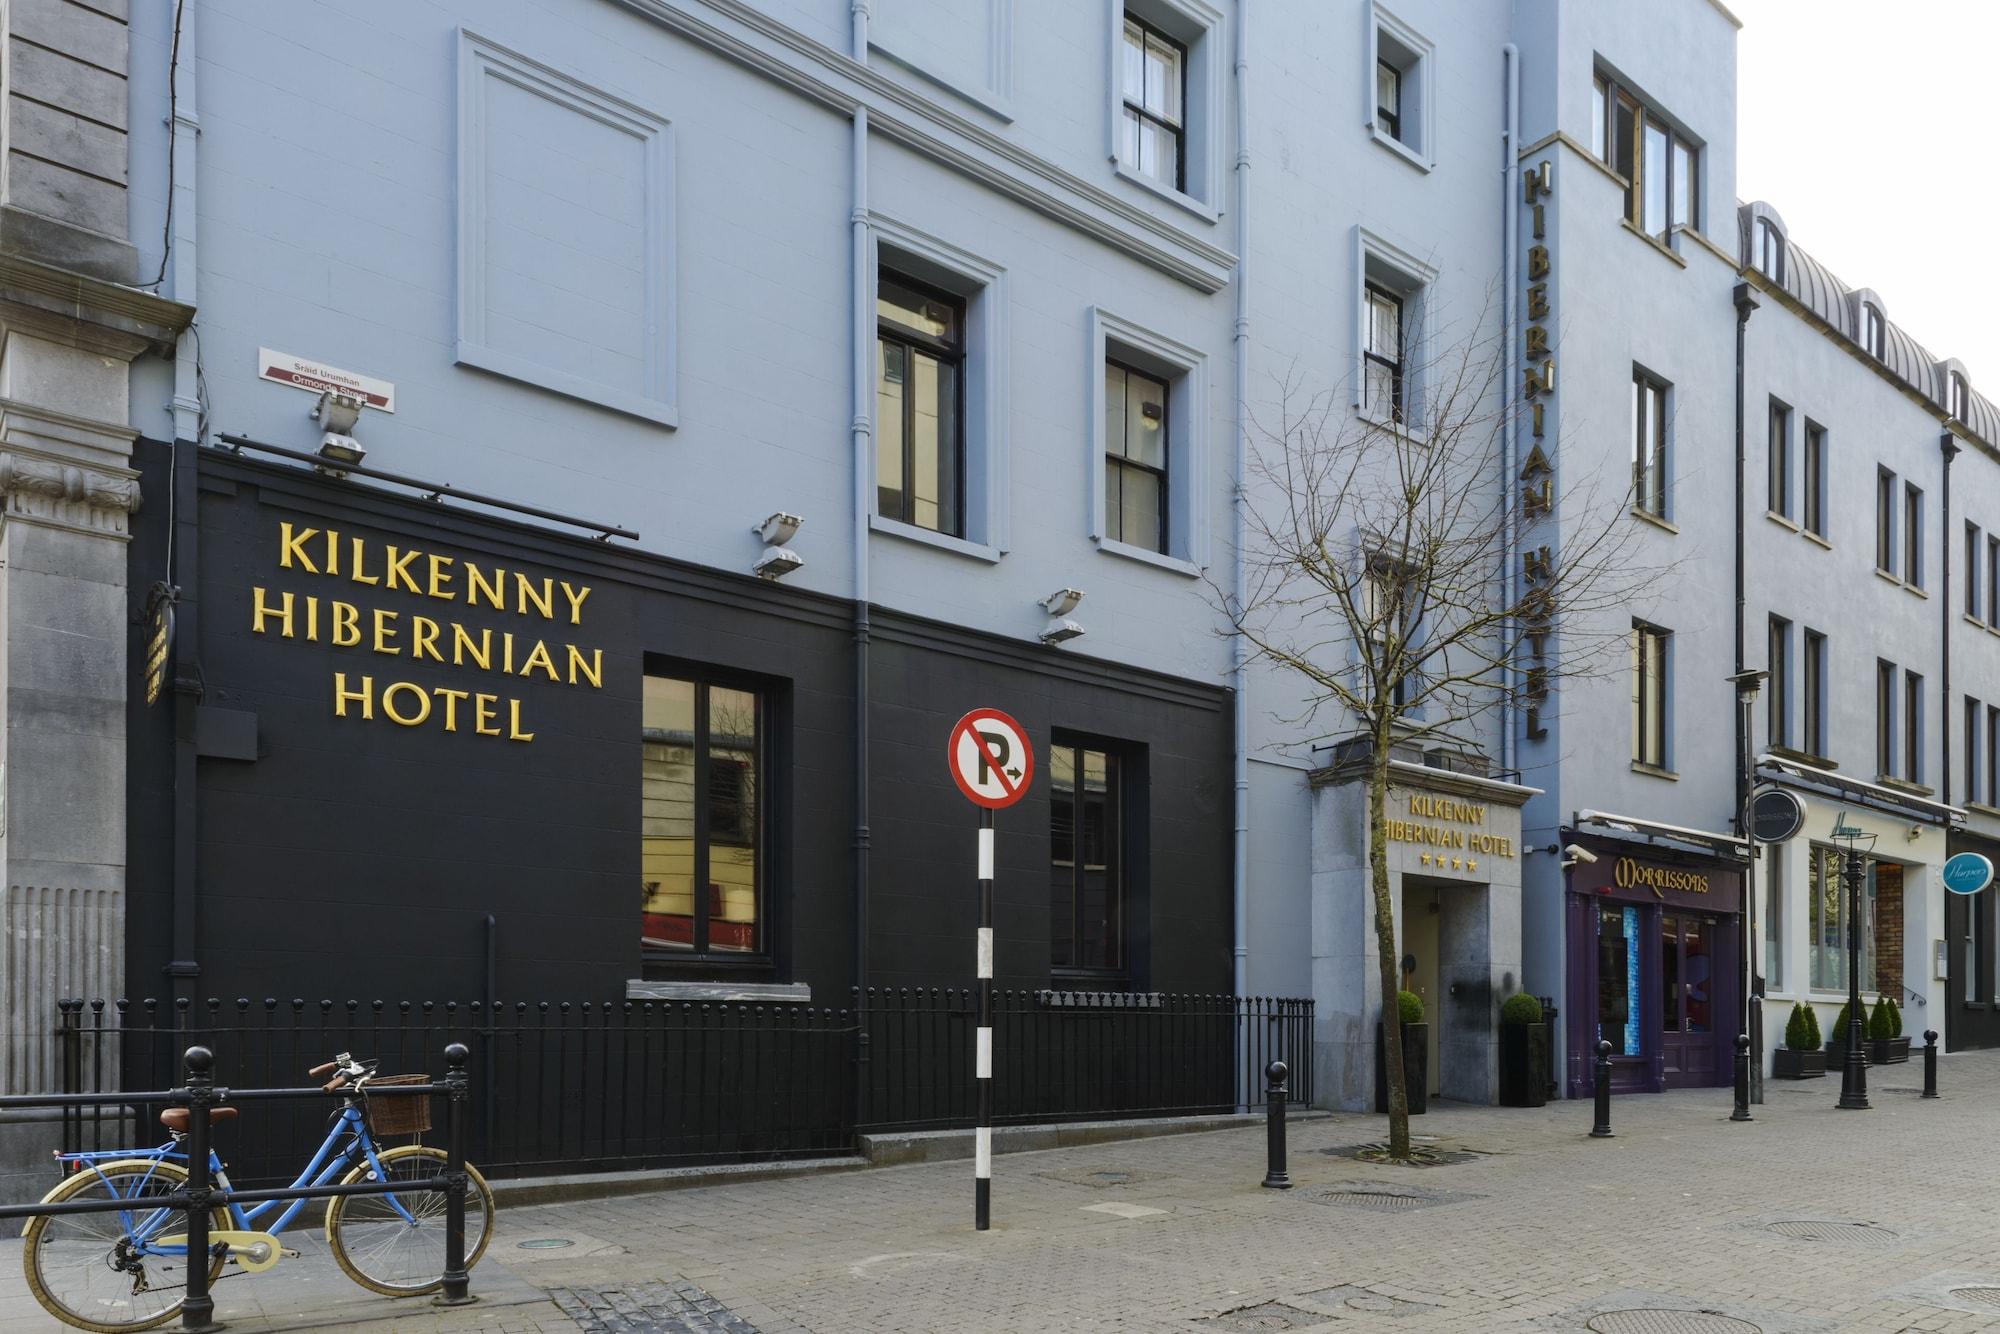 Kilkenny Hibernian Hotel,